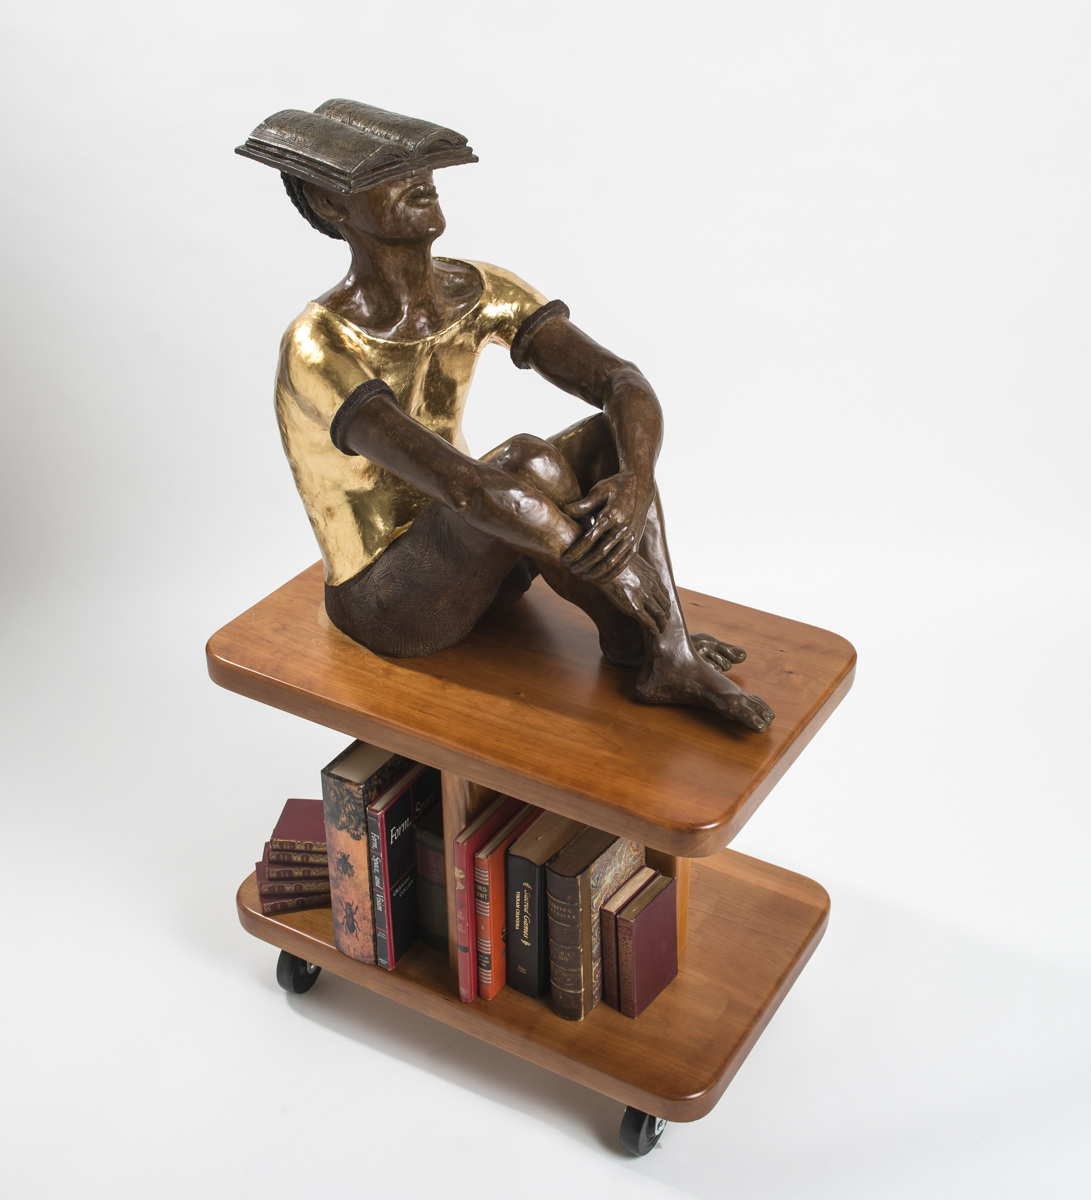 Book Man (large view)